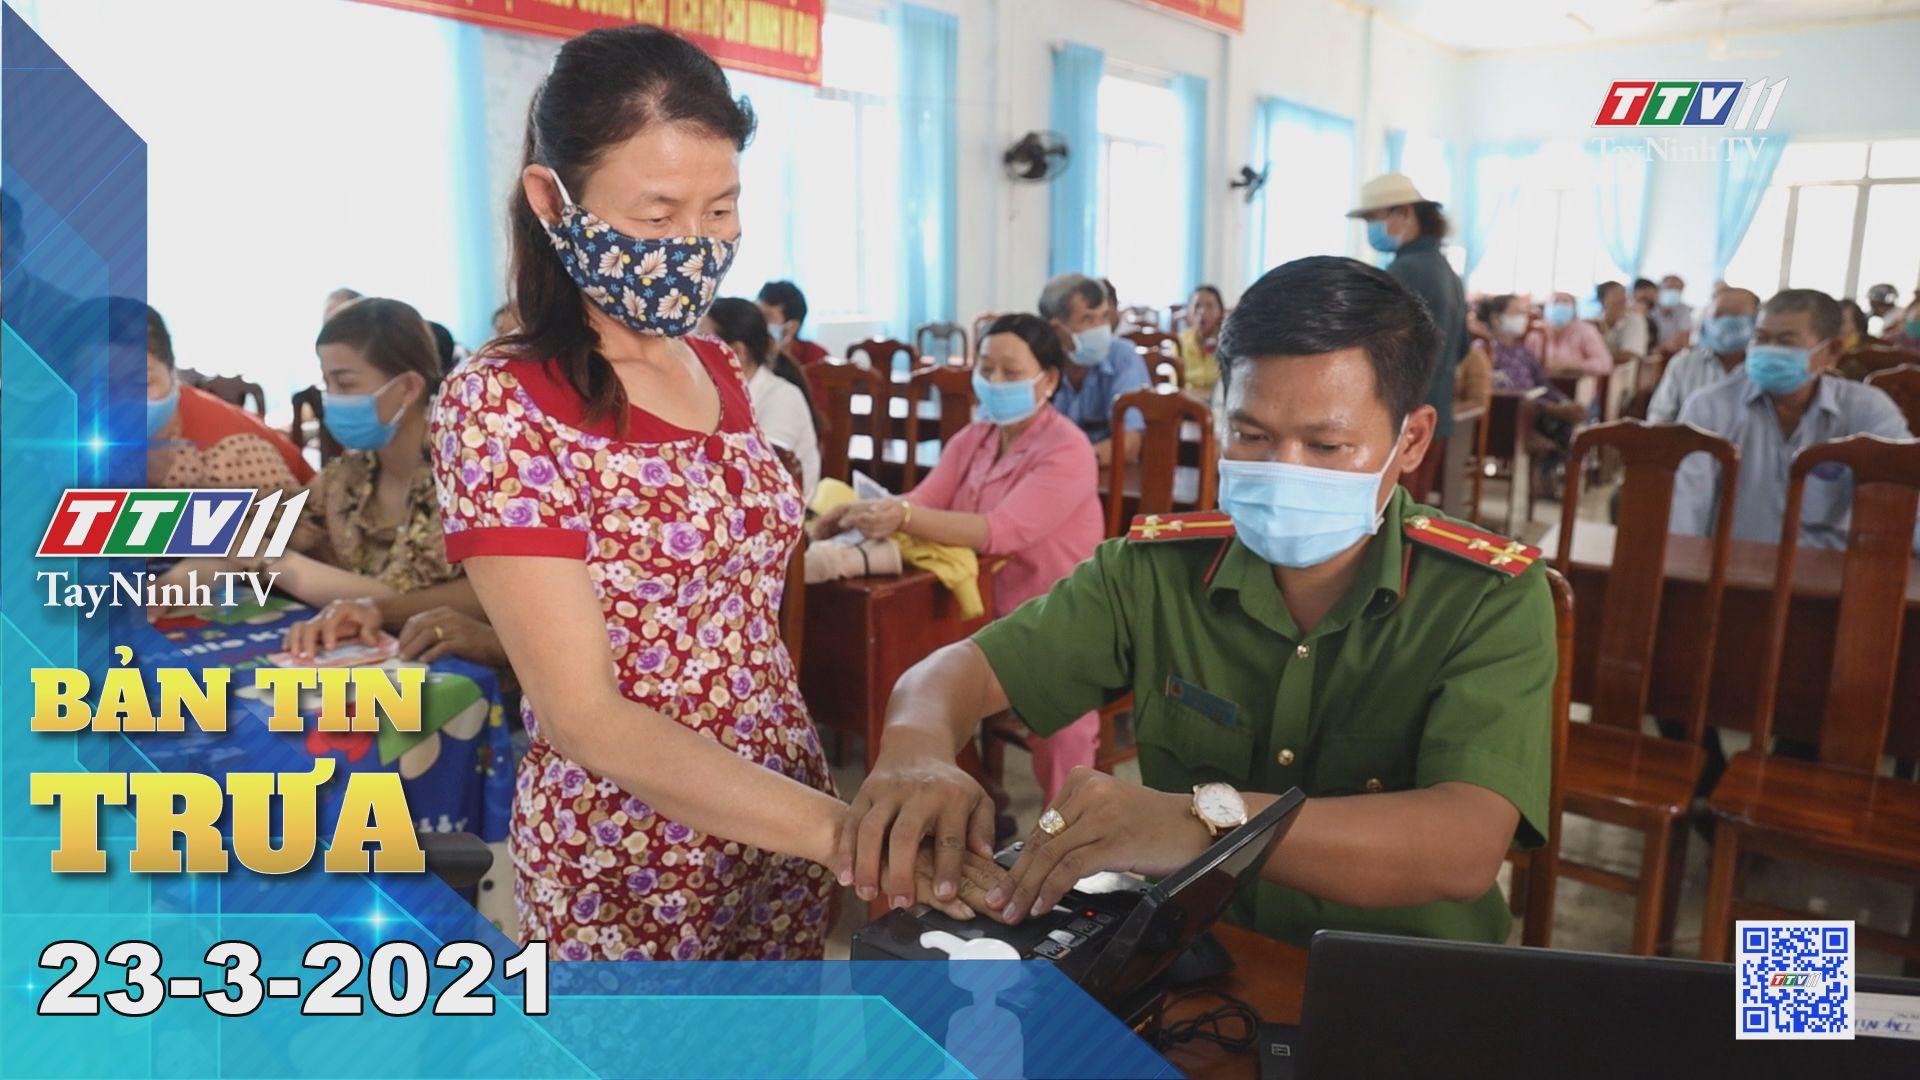 Bản tin trưa 23-3-2021 | Tin tức hôm nay | TayNinhTV